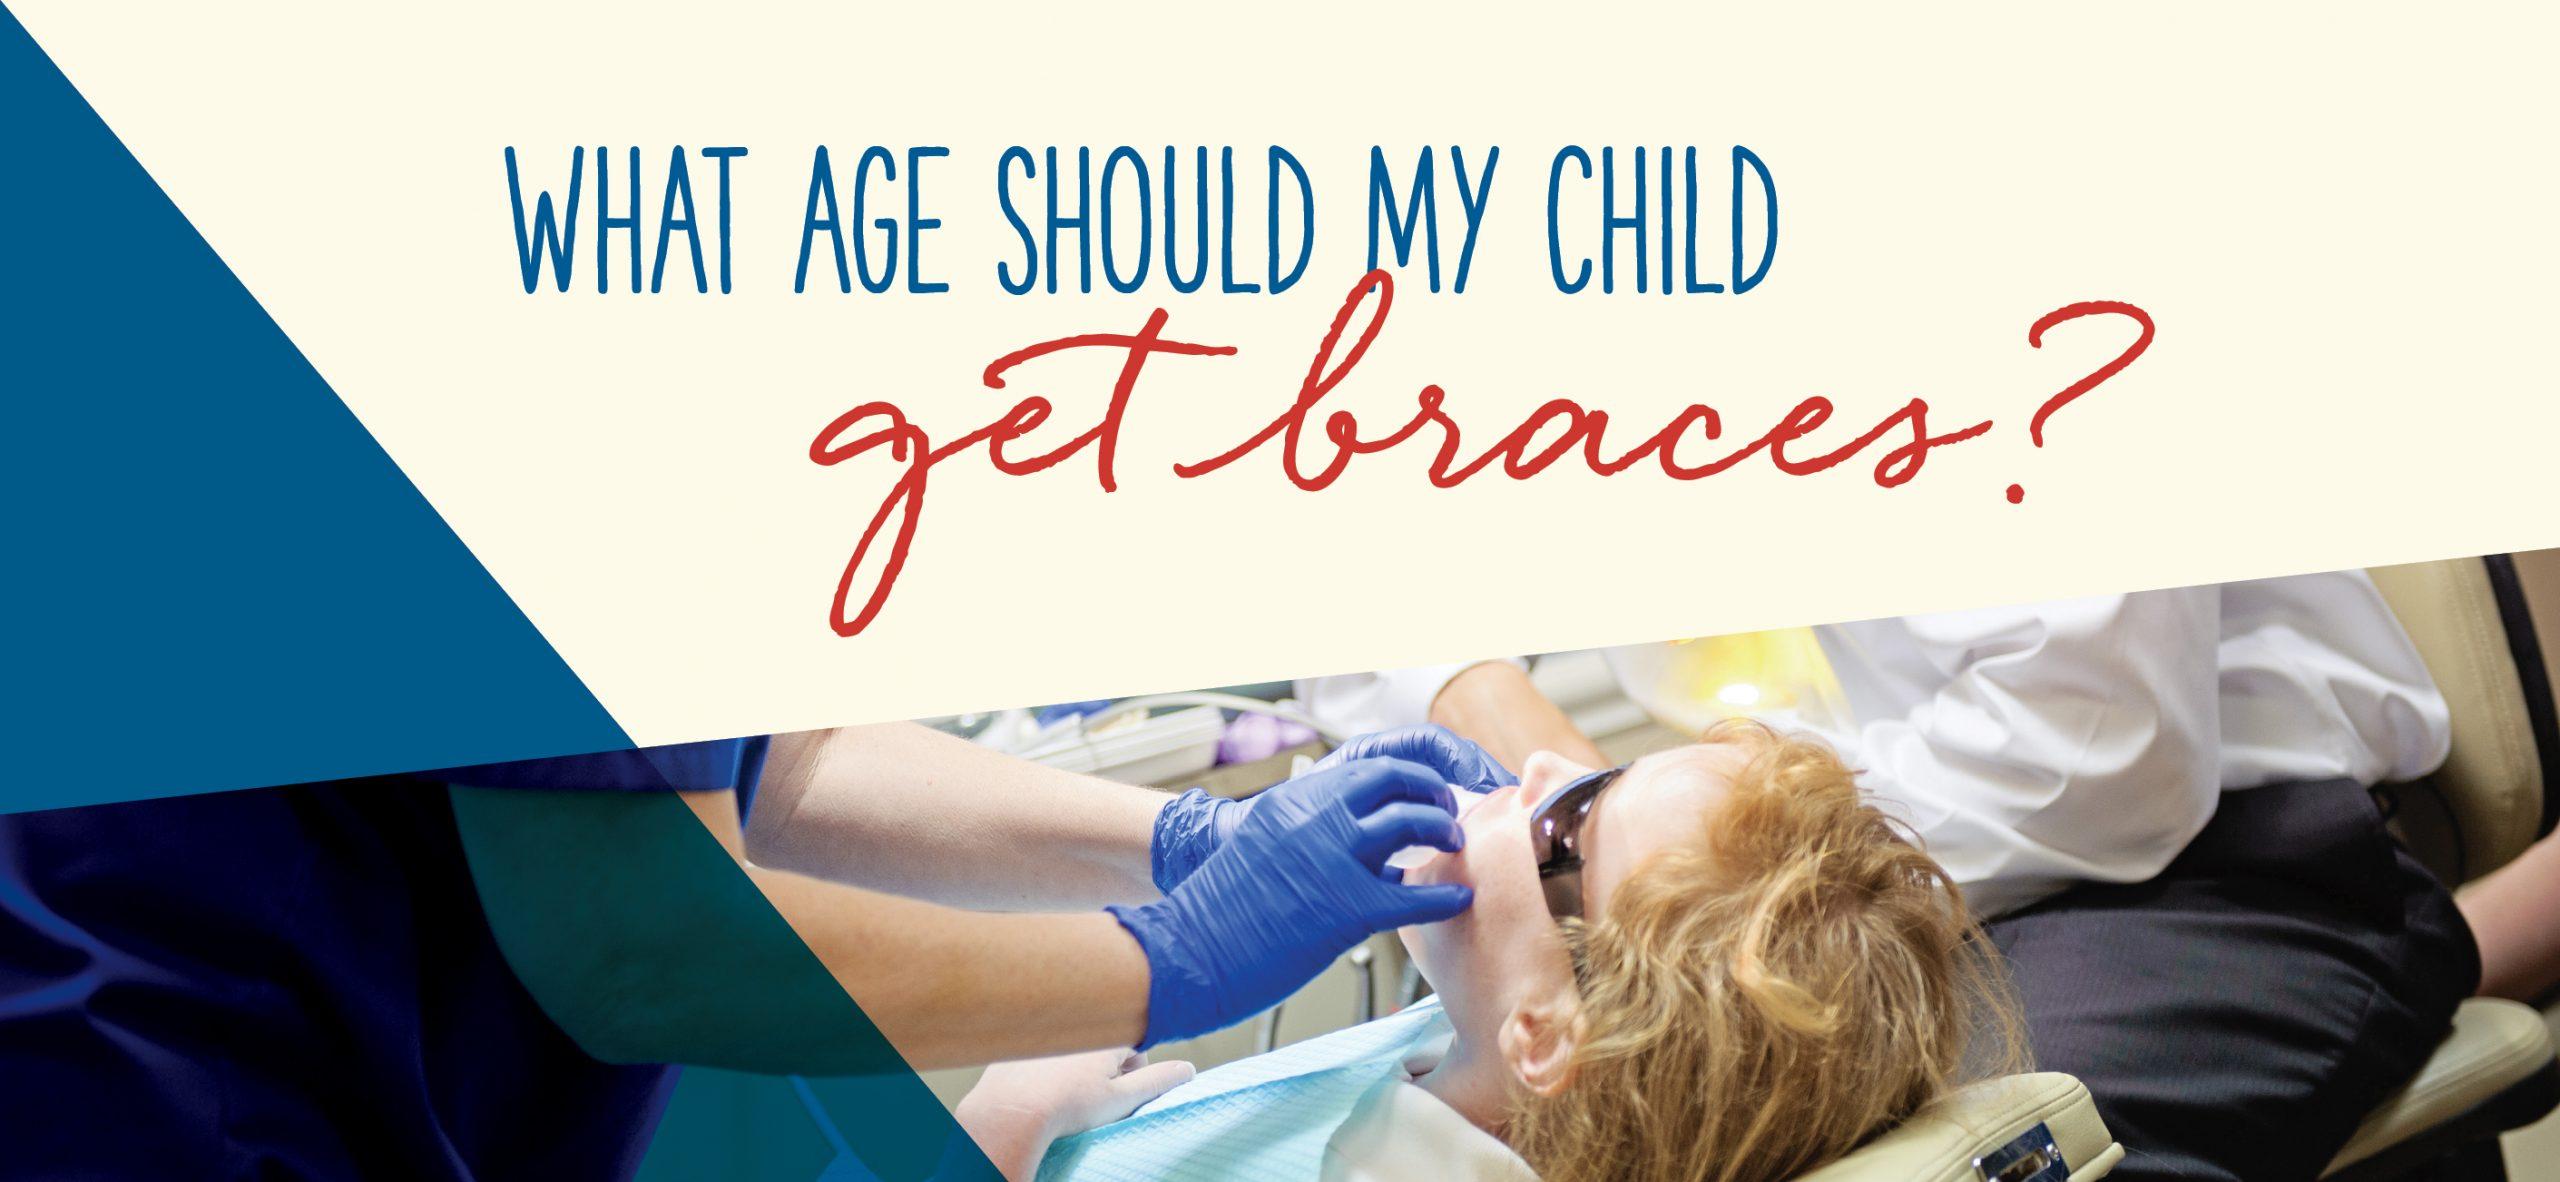 When Should My Child Get Braces?